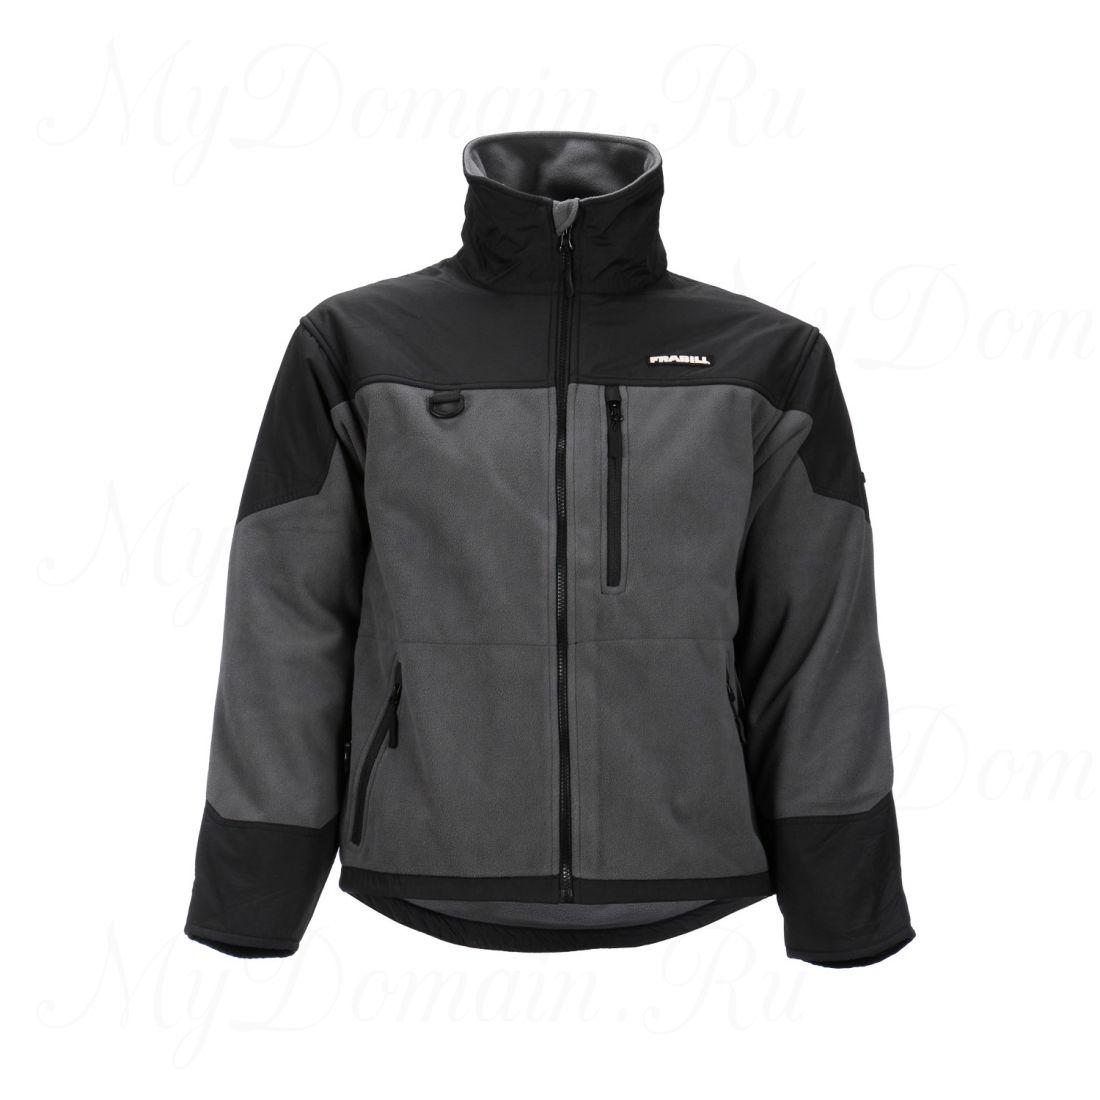 Куртка флисовая Frabill FXE WINDPROOF FLEECE Jacket размер M